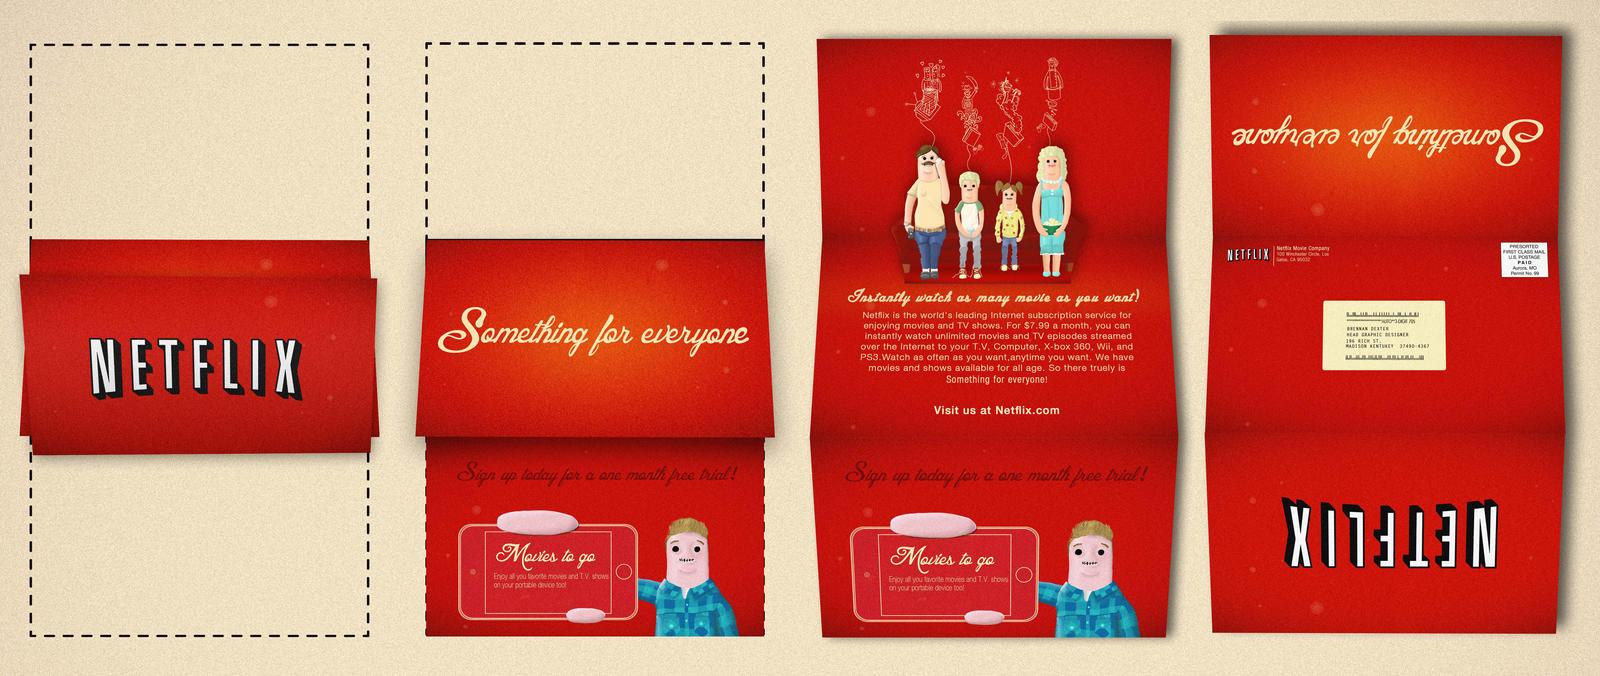 Netflix Print Self Mailer By Adamkoon On Deviantart